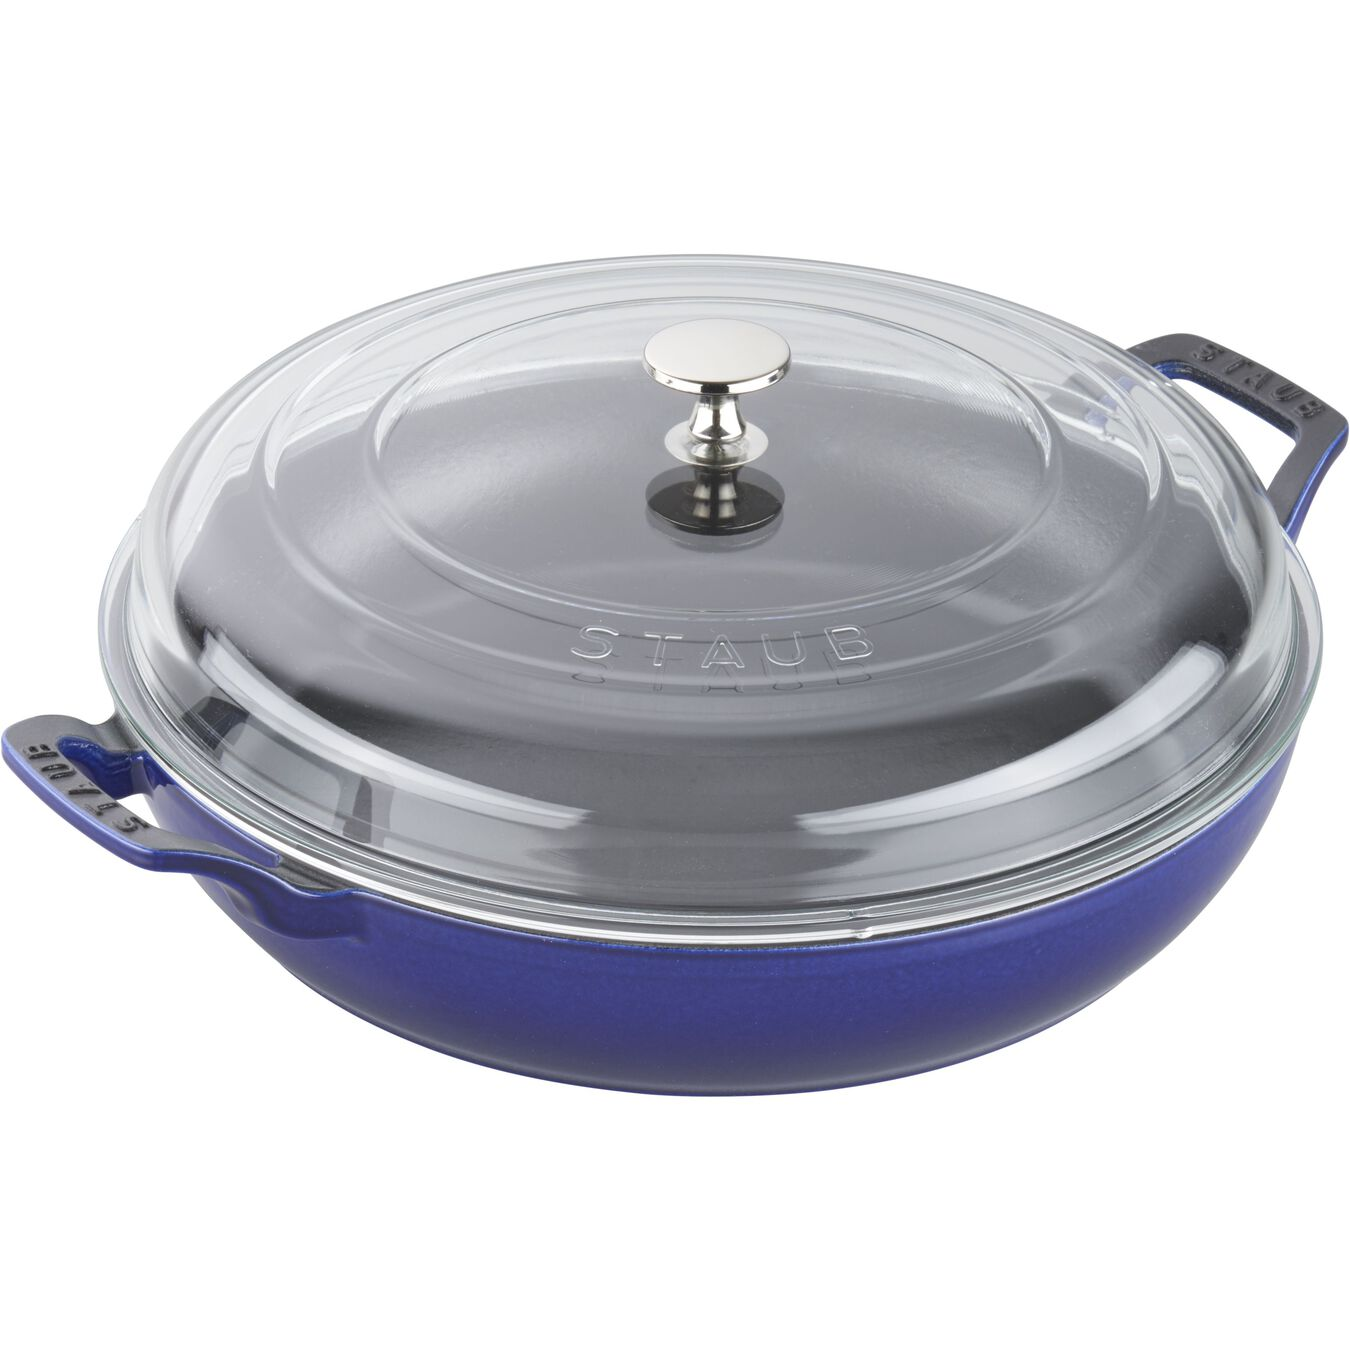 3.5-qt Braiser with Glass Lid - Dark Blue,,large 3